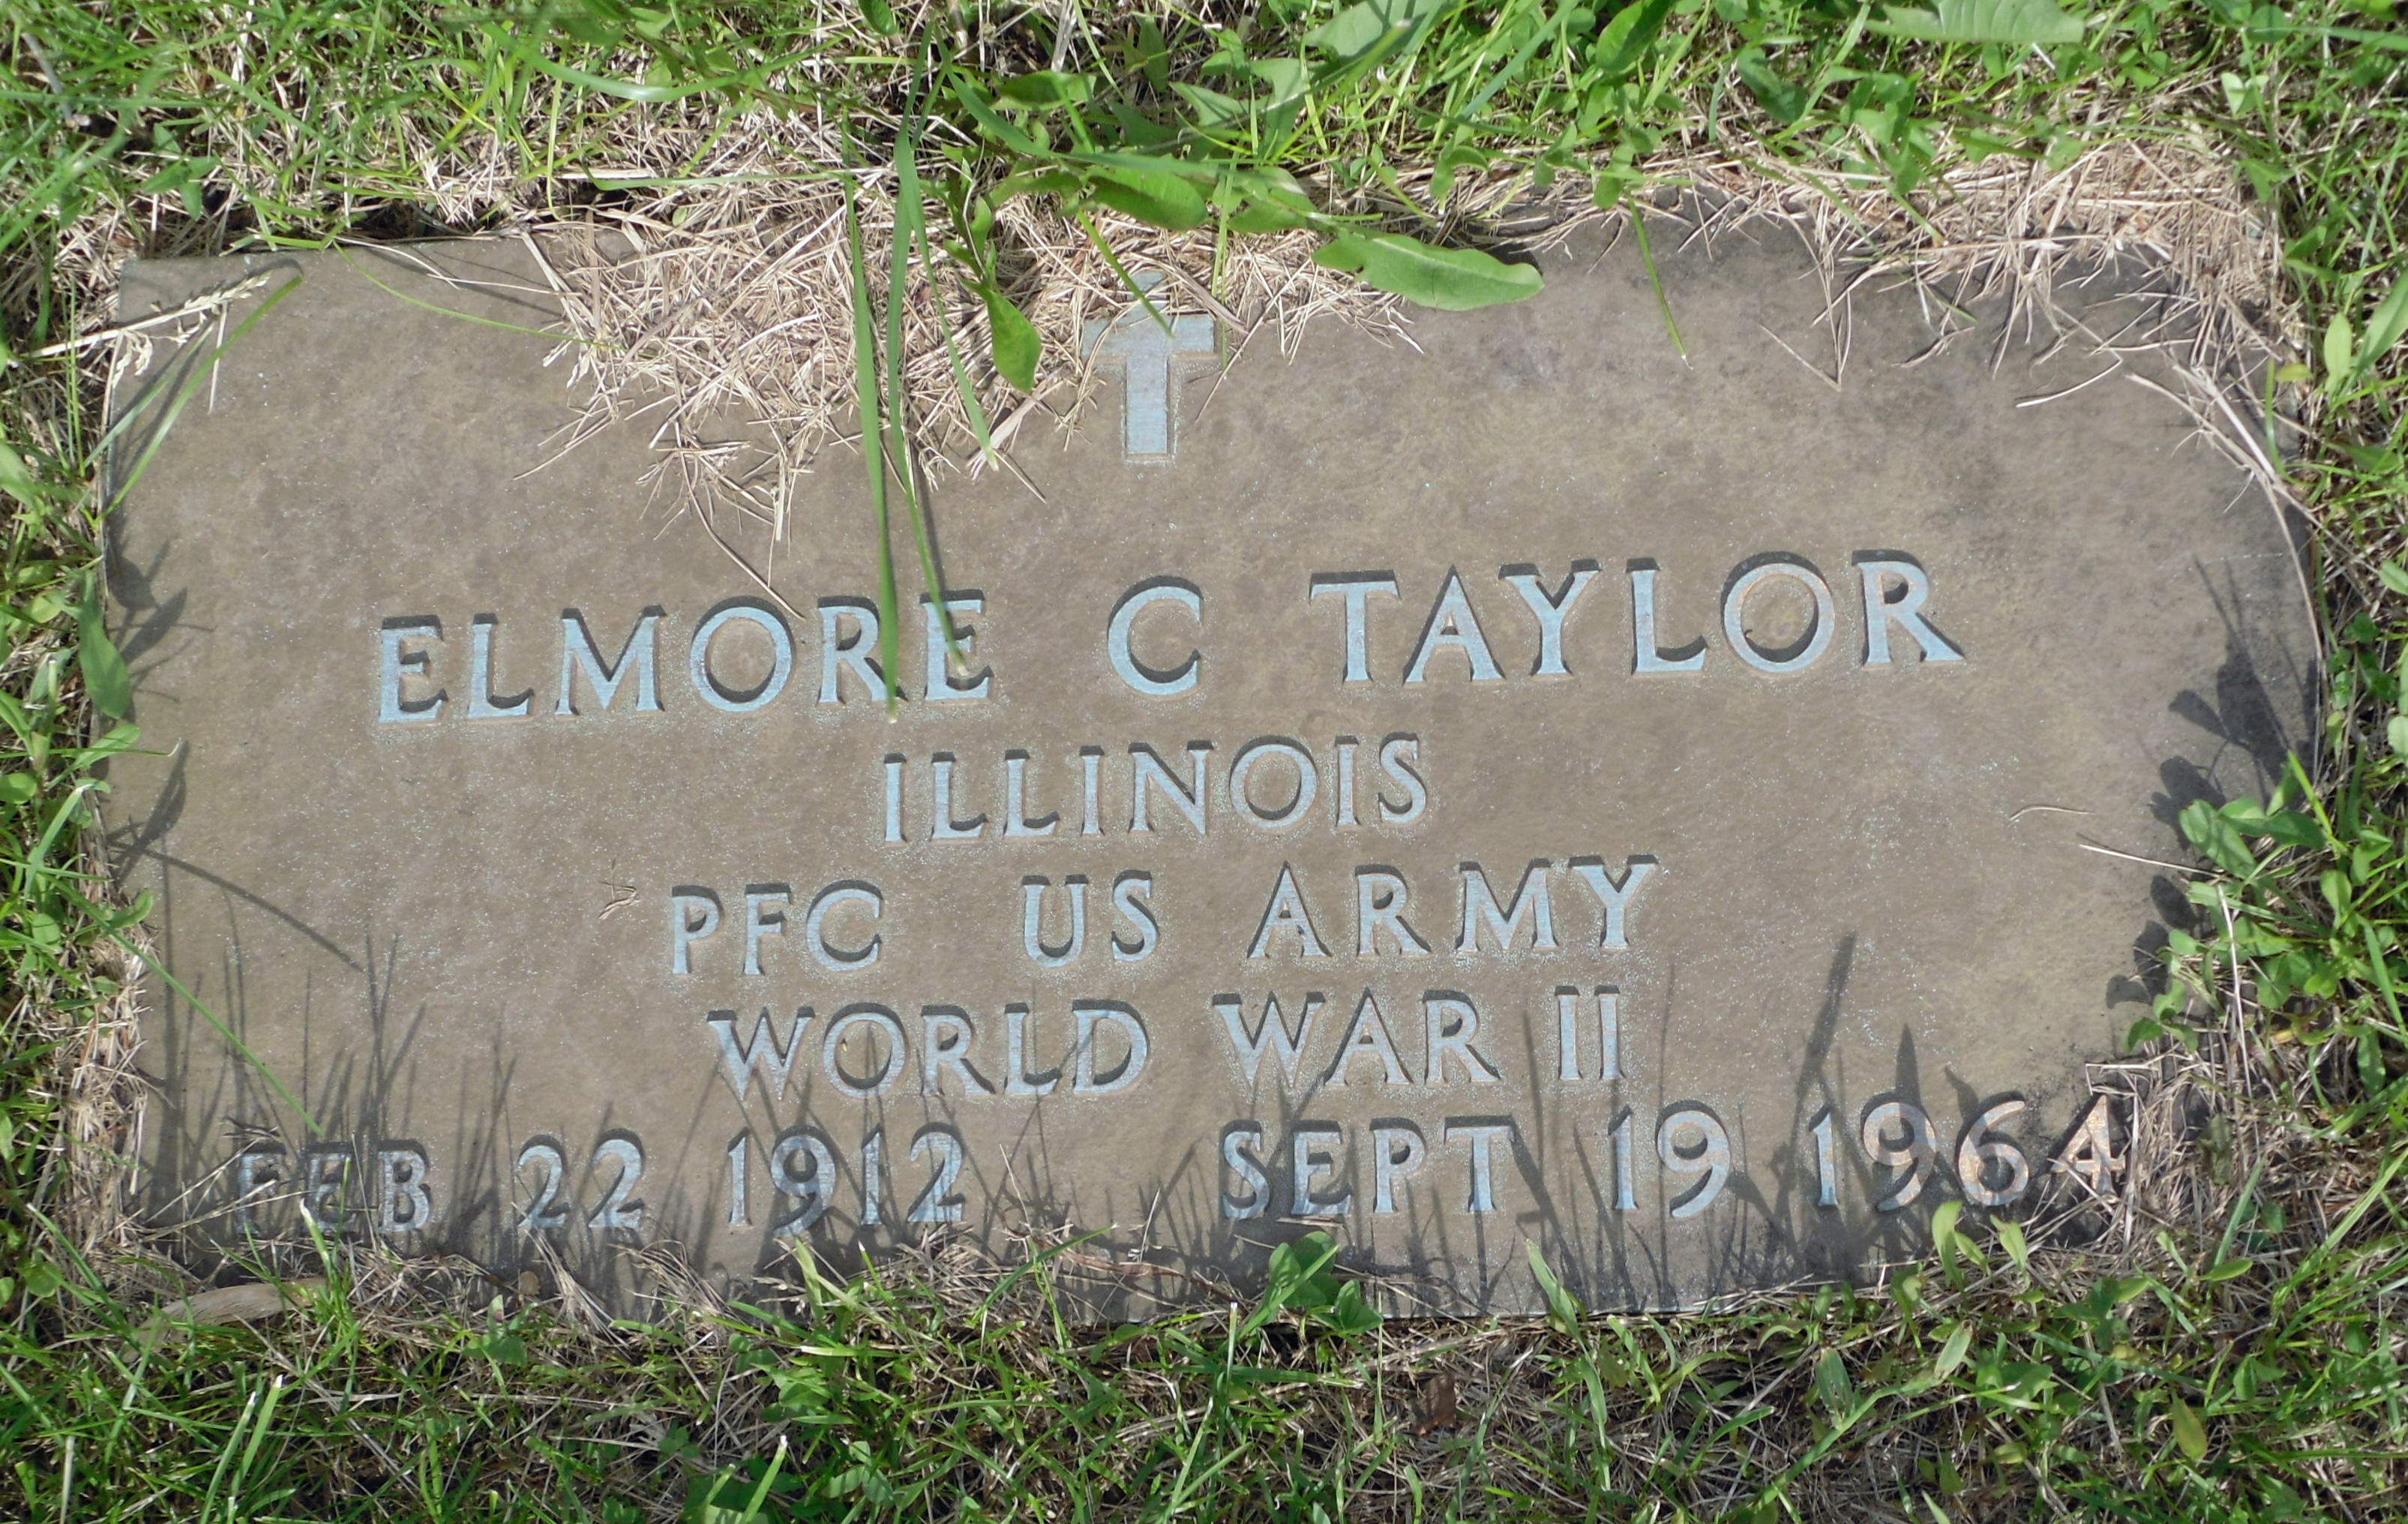 Elmore C. Taylor